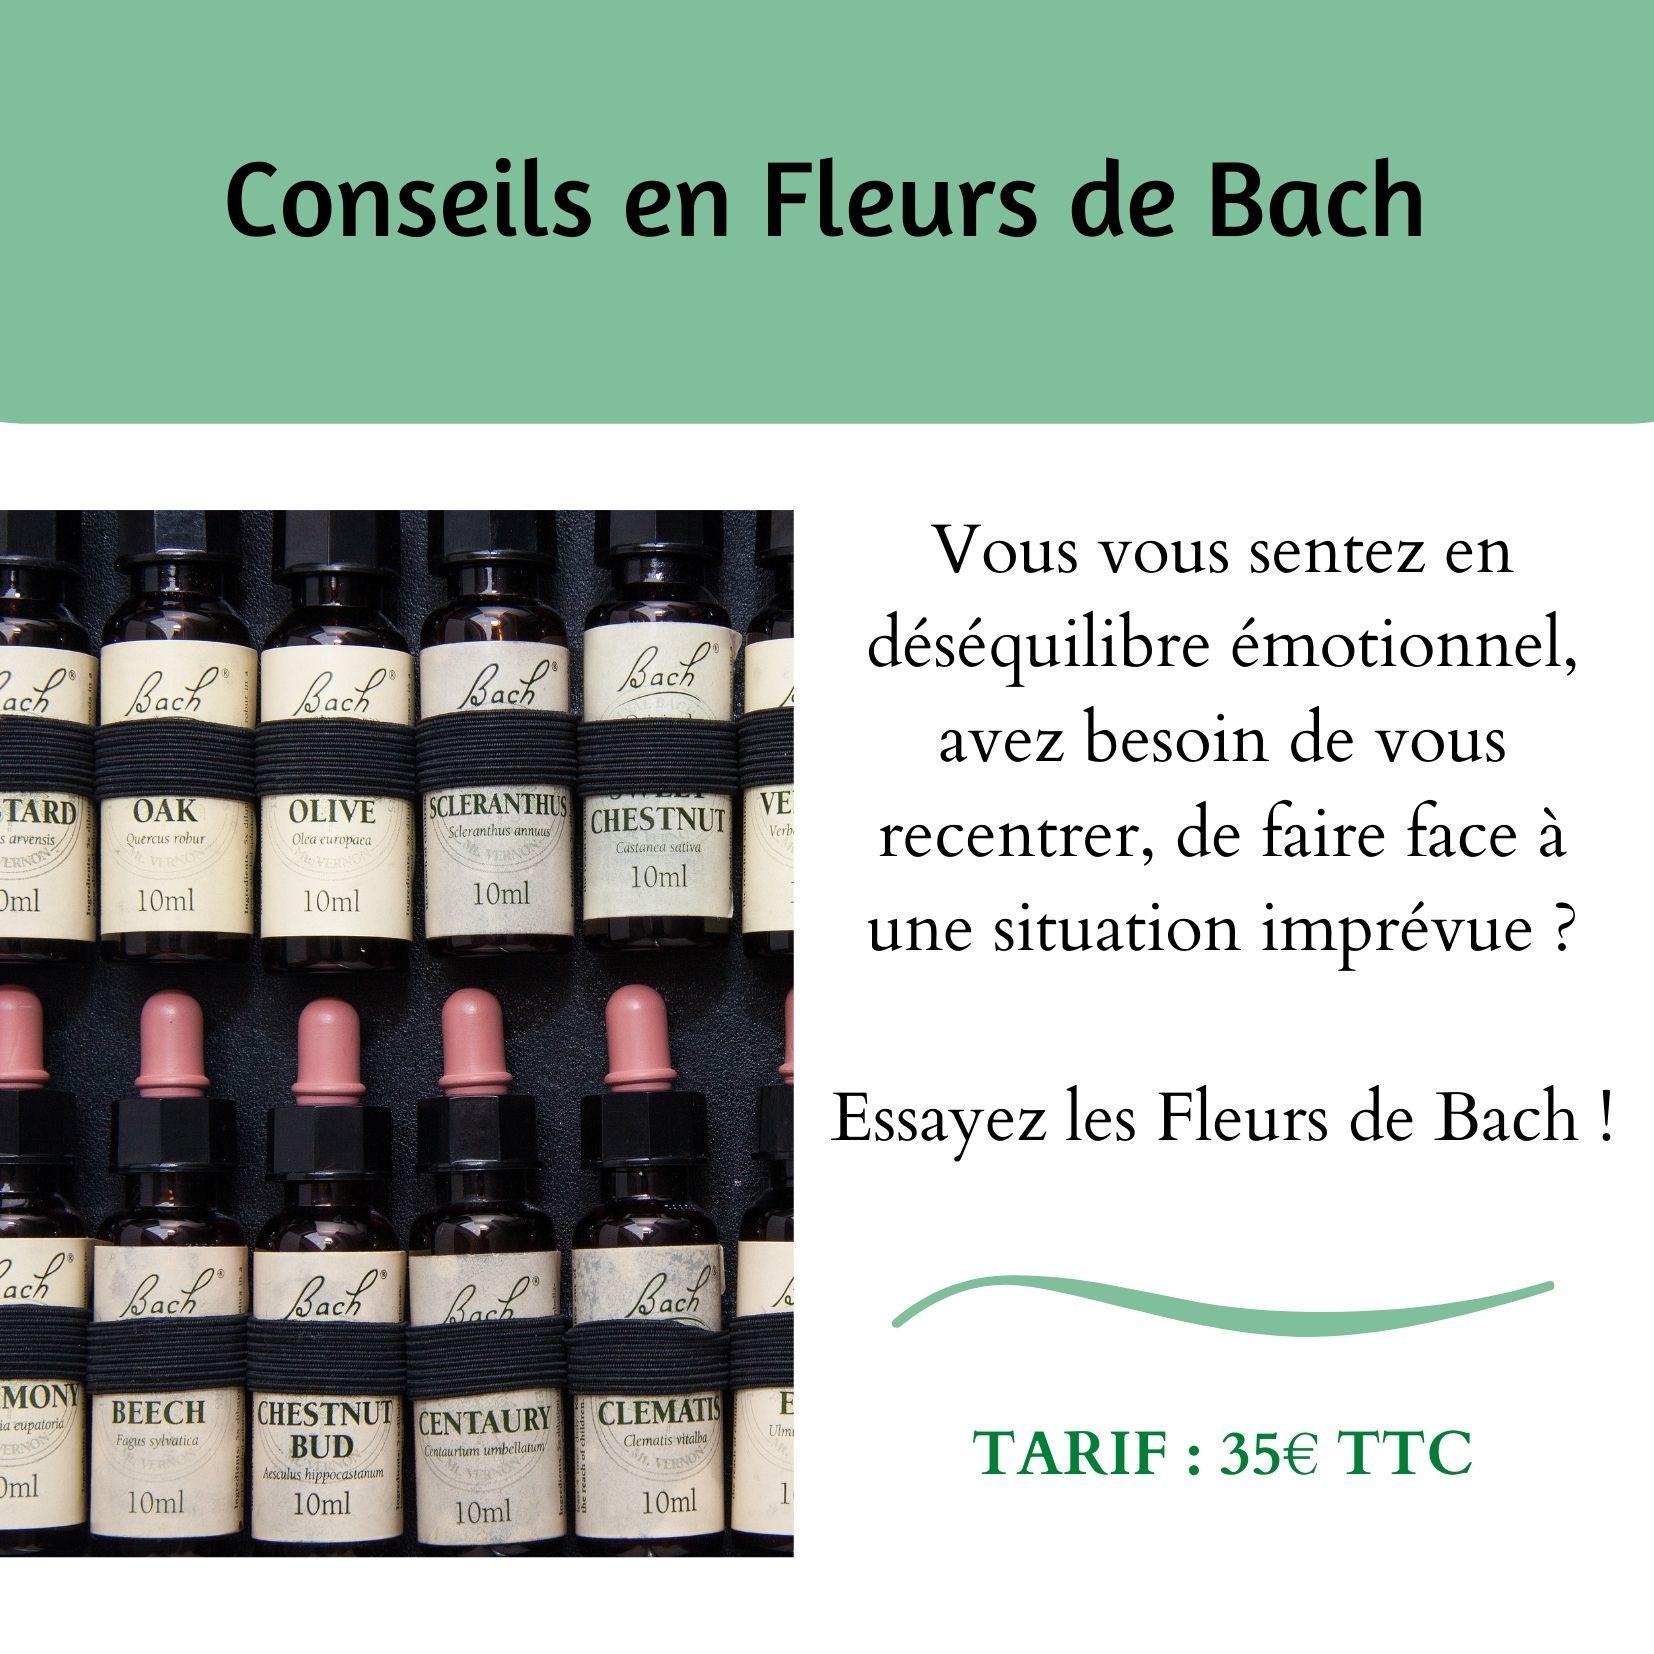 Conseils Fleurs de Bach - Humains